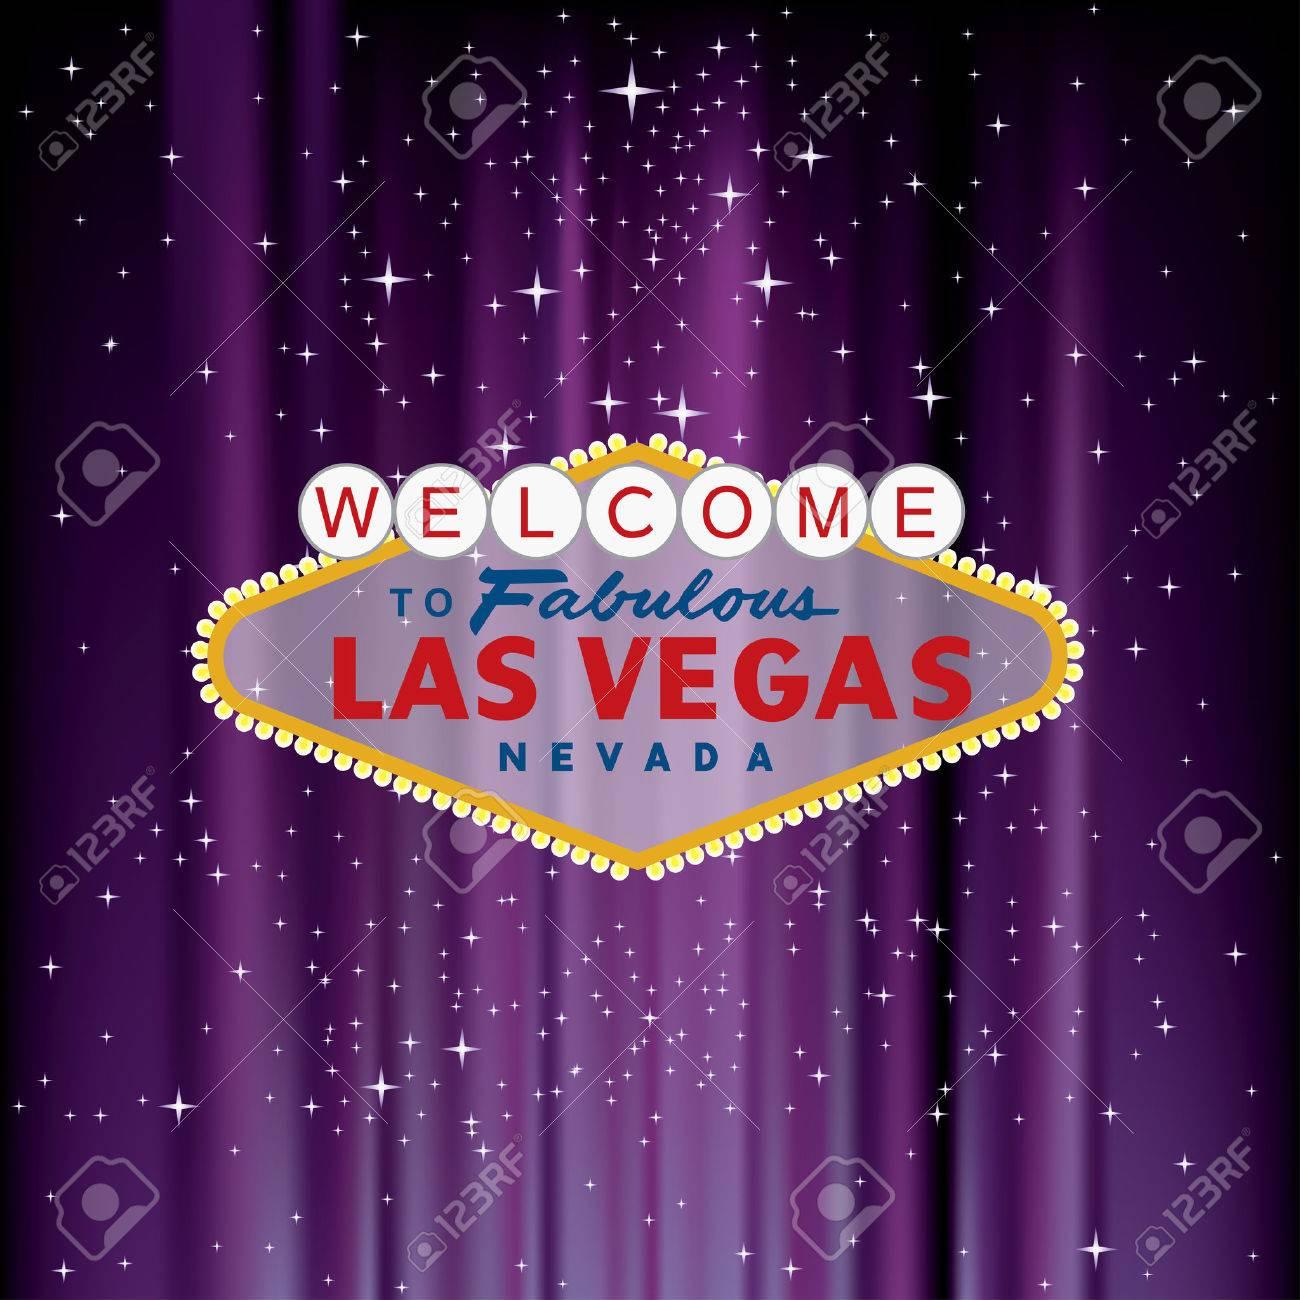 Las Vegas sign on purple velvet with stars - 43737778